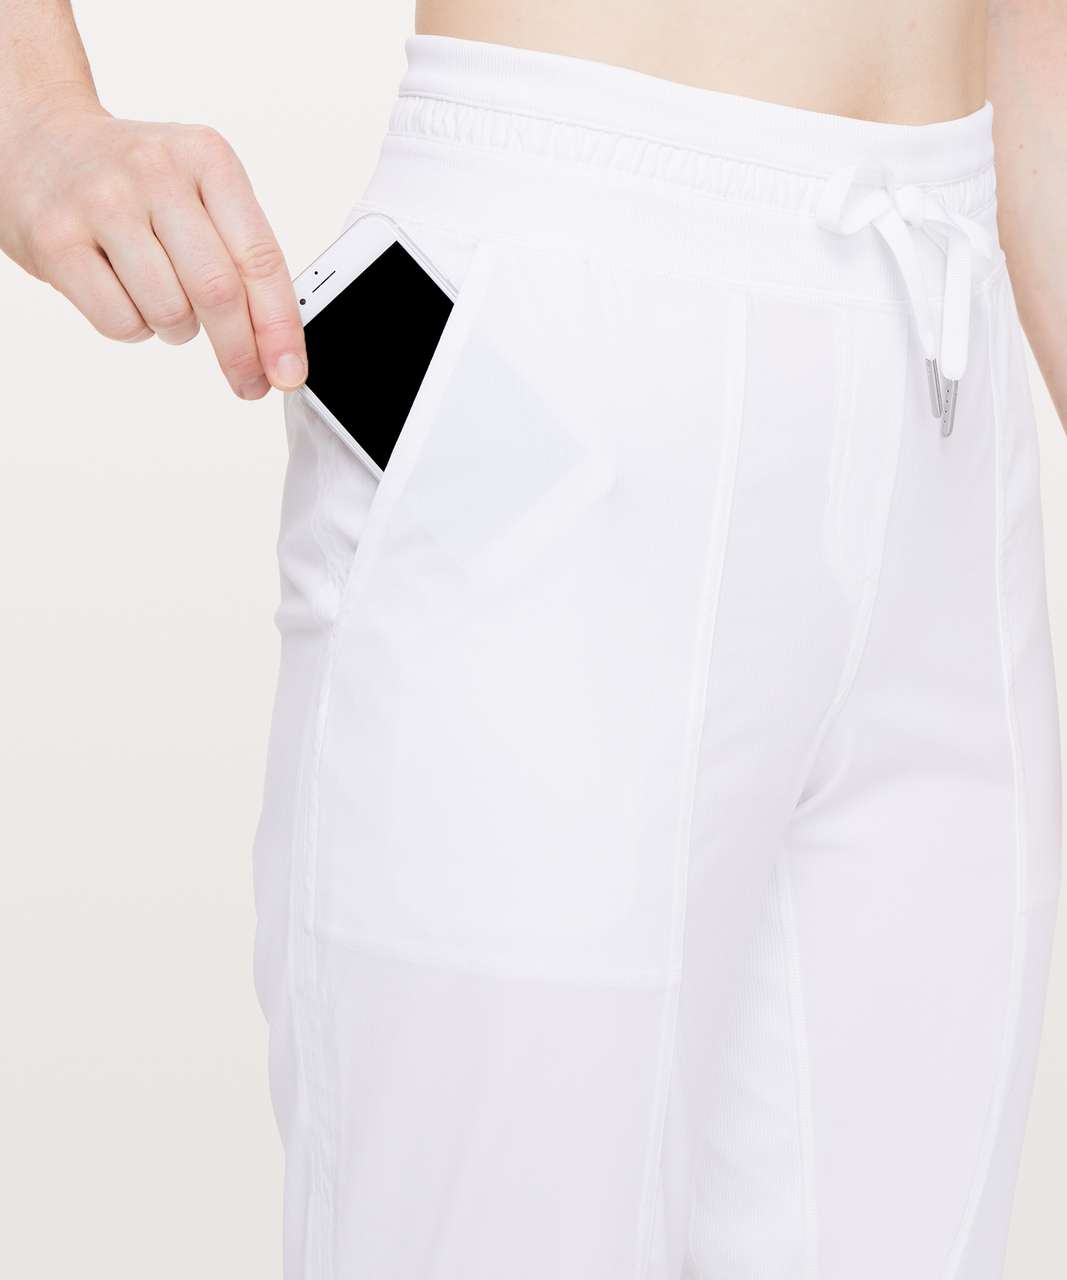 "Lululemon Dance Studio Crop *25"" - White (First Release)"